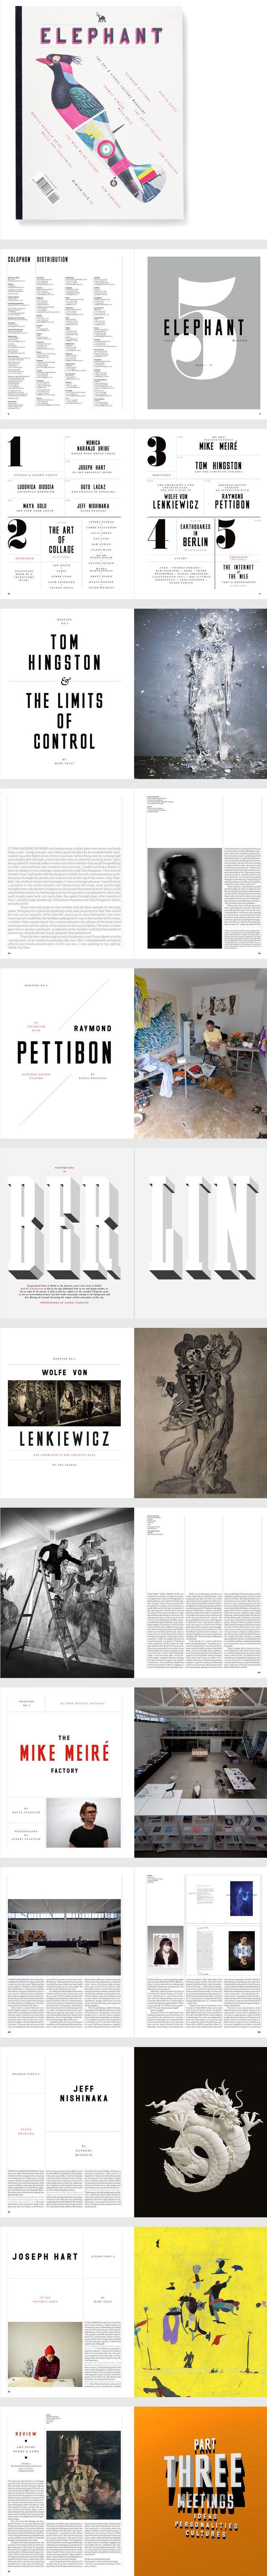 Elephant Magazine, Issue 5 by Matt Willey